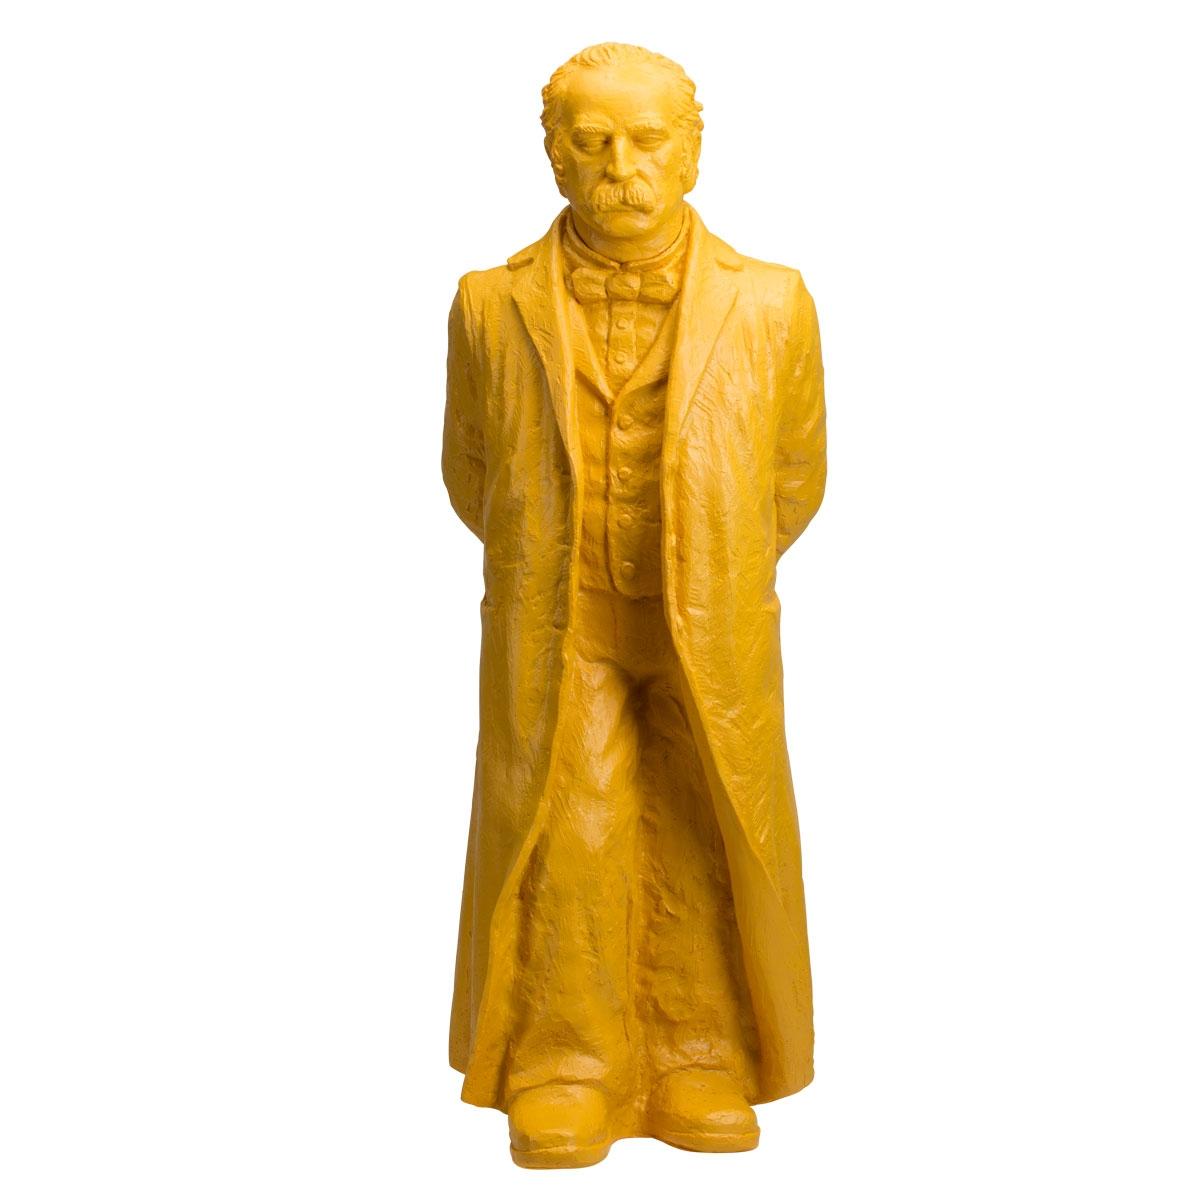 Sculpture, Theodor Fontane , de Ottmar Horl